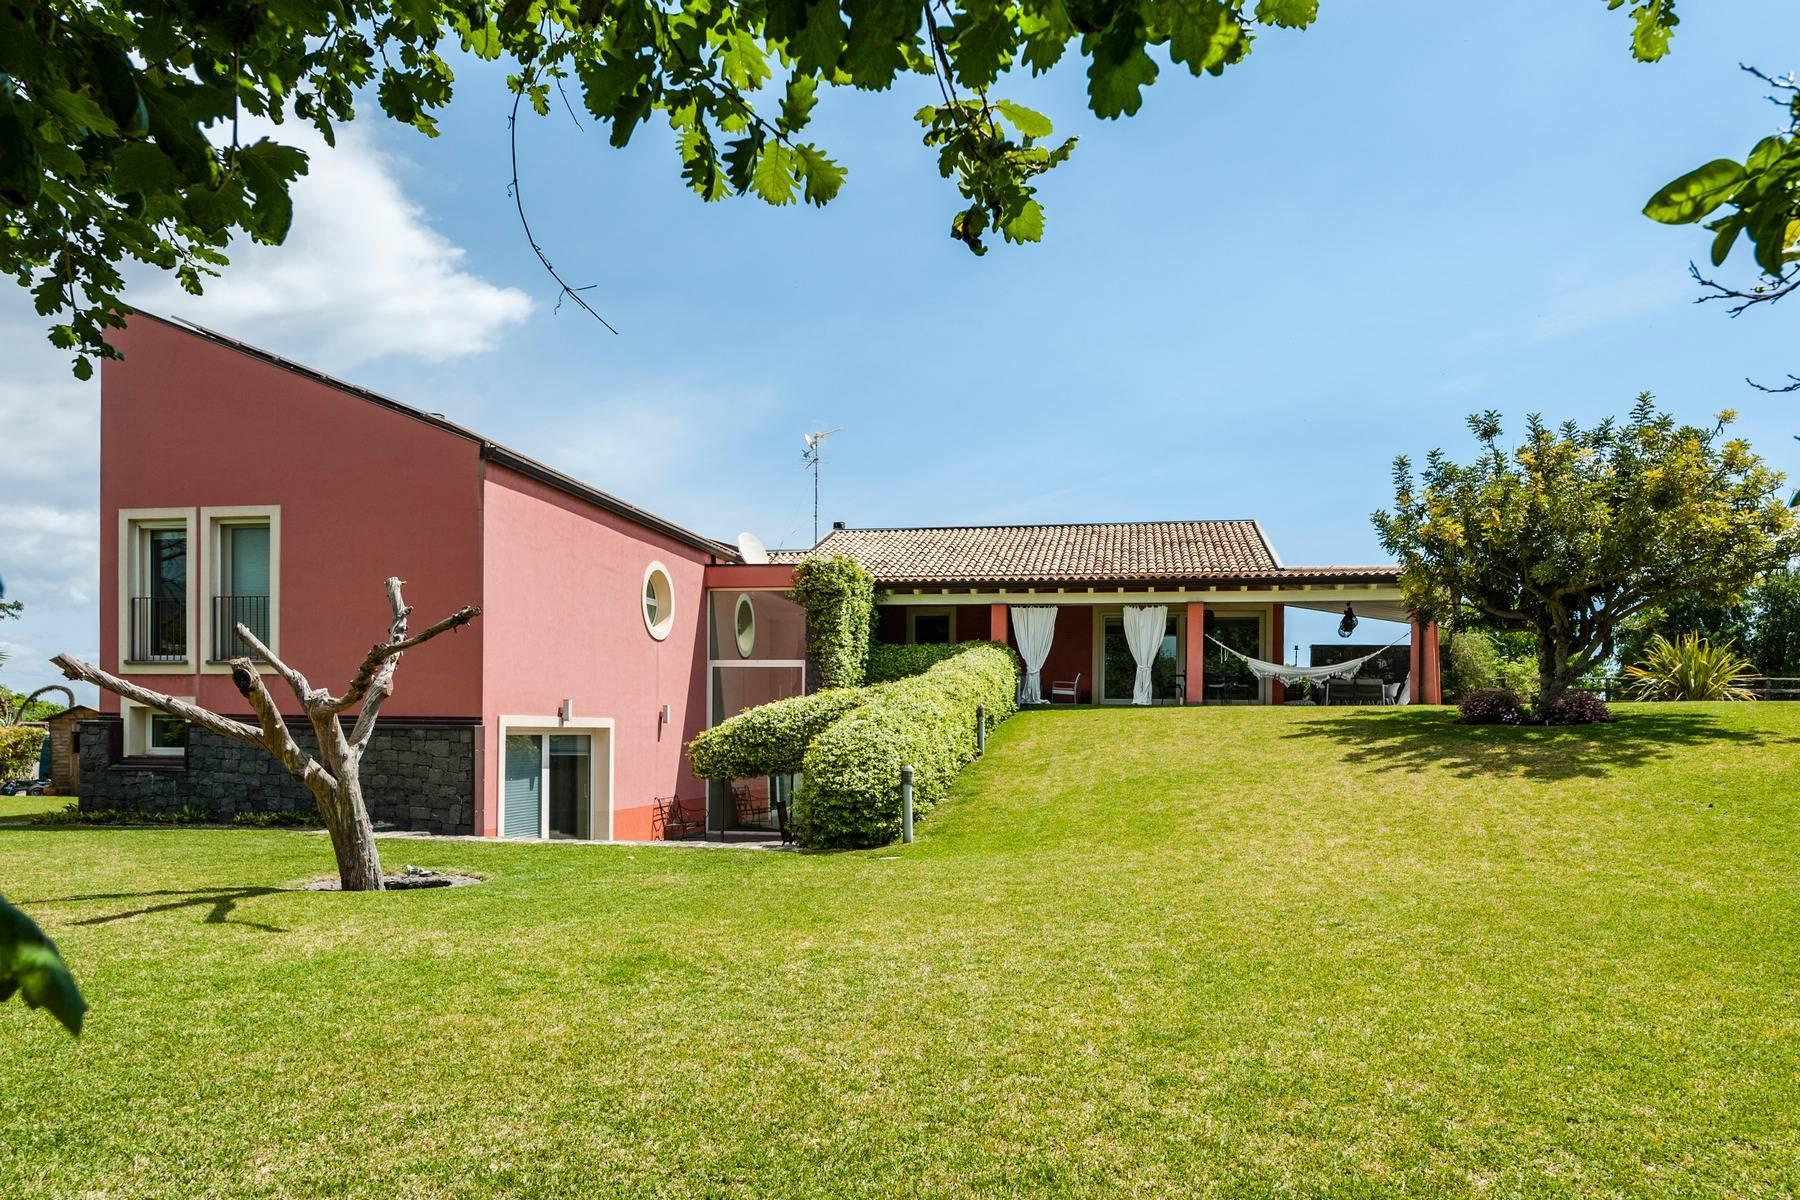 Villa esclusiva con piscina con vista ad Acireale - 11